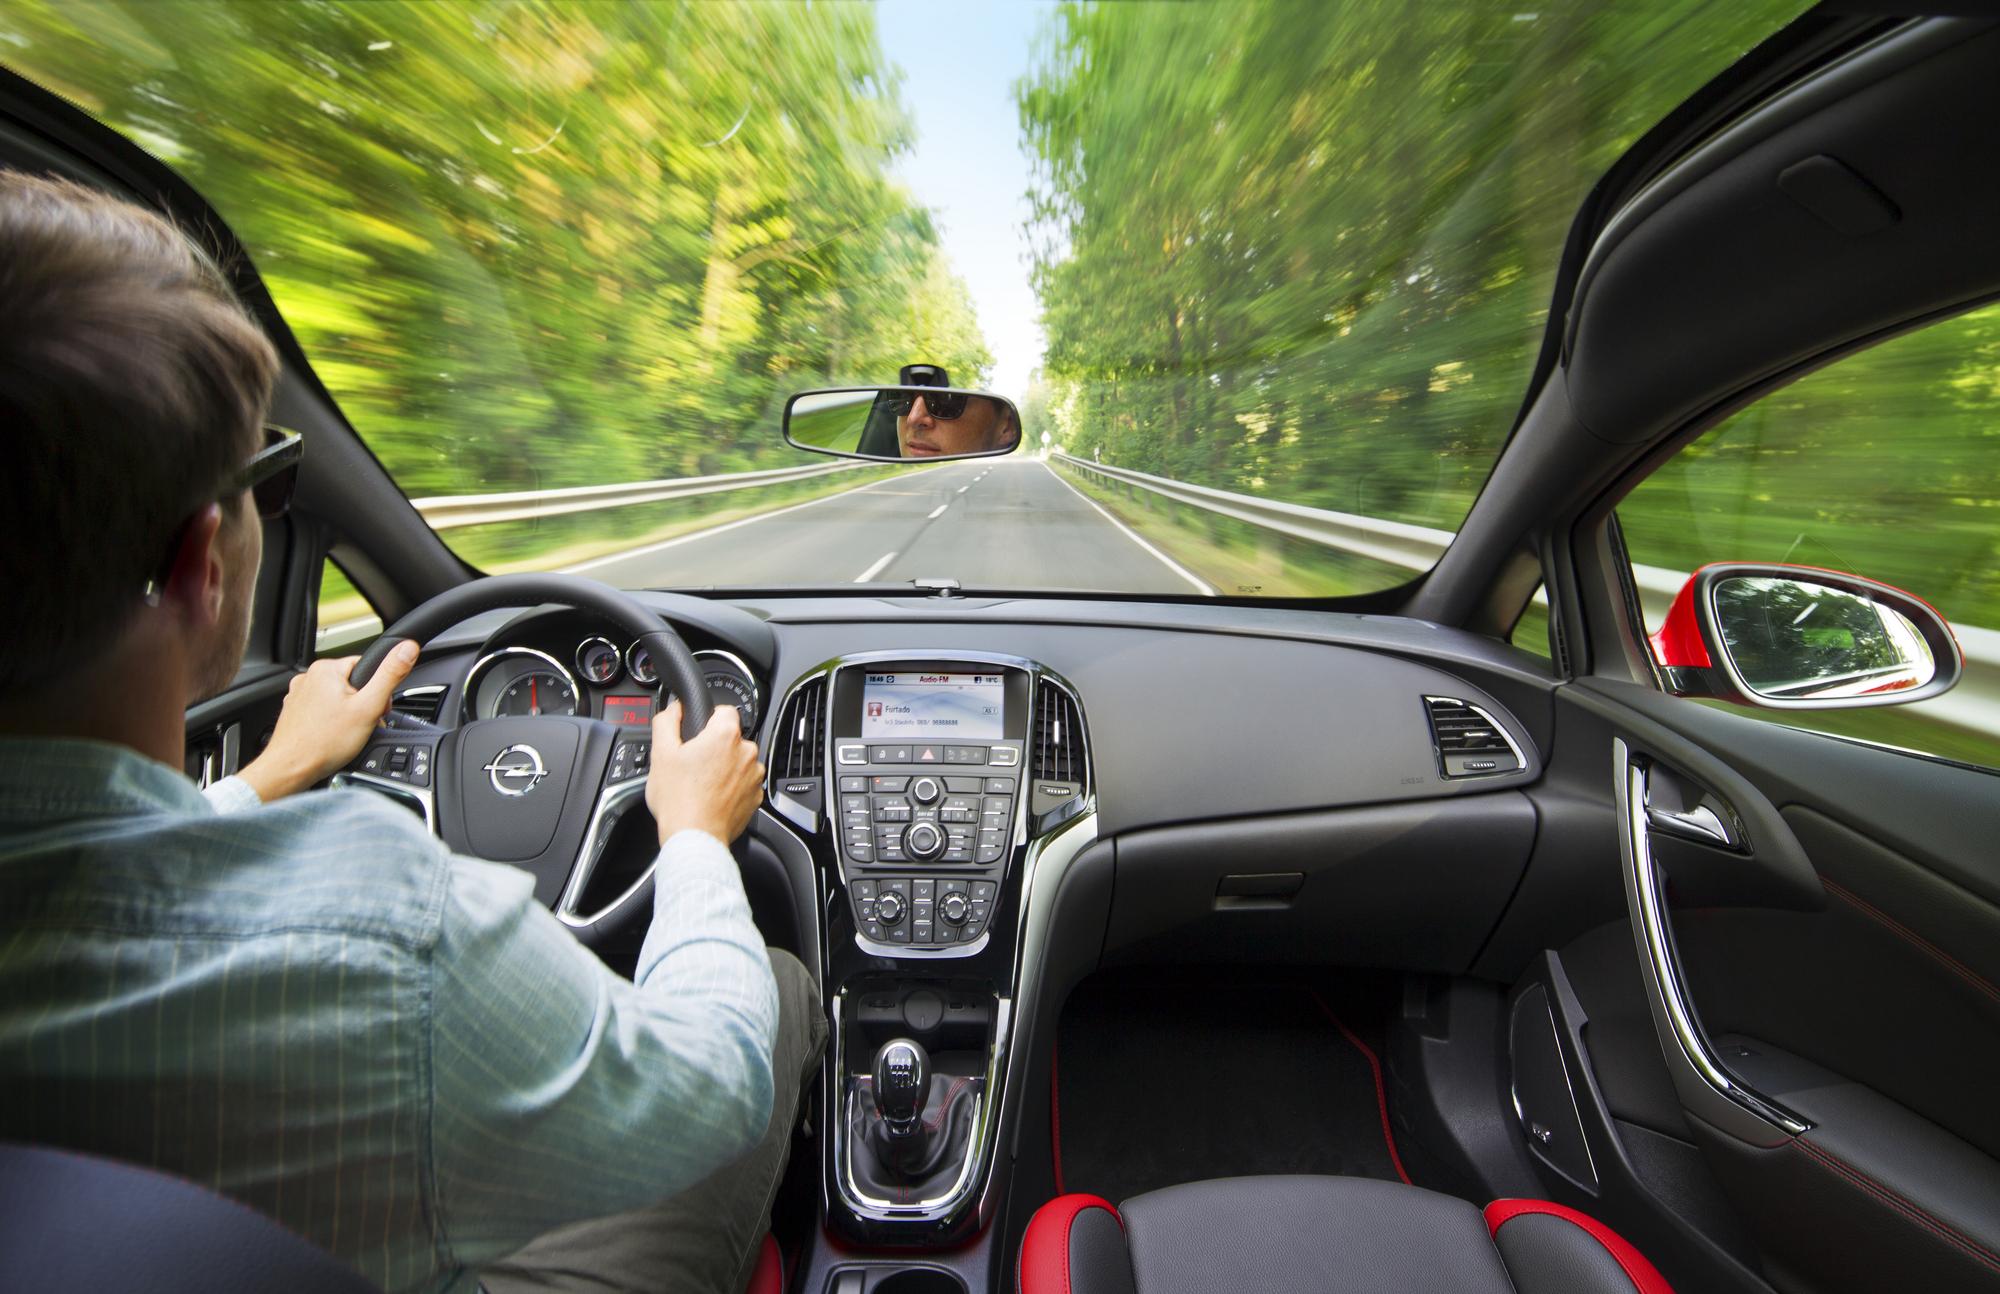 Gla 2018 Interior >> Opel Introduces 195hp, 2.0l Biturbo Diesel on Astra GTC slideshow :: autoviva.com